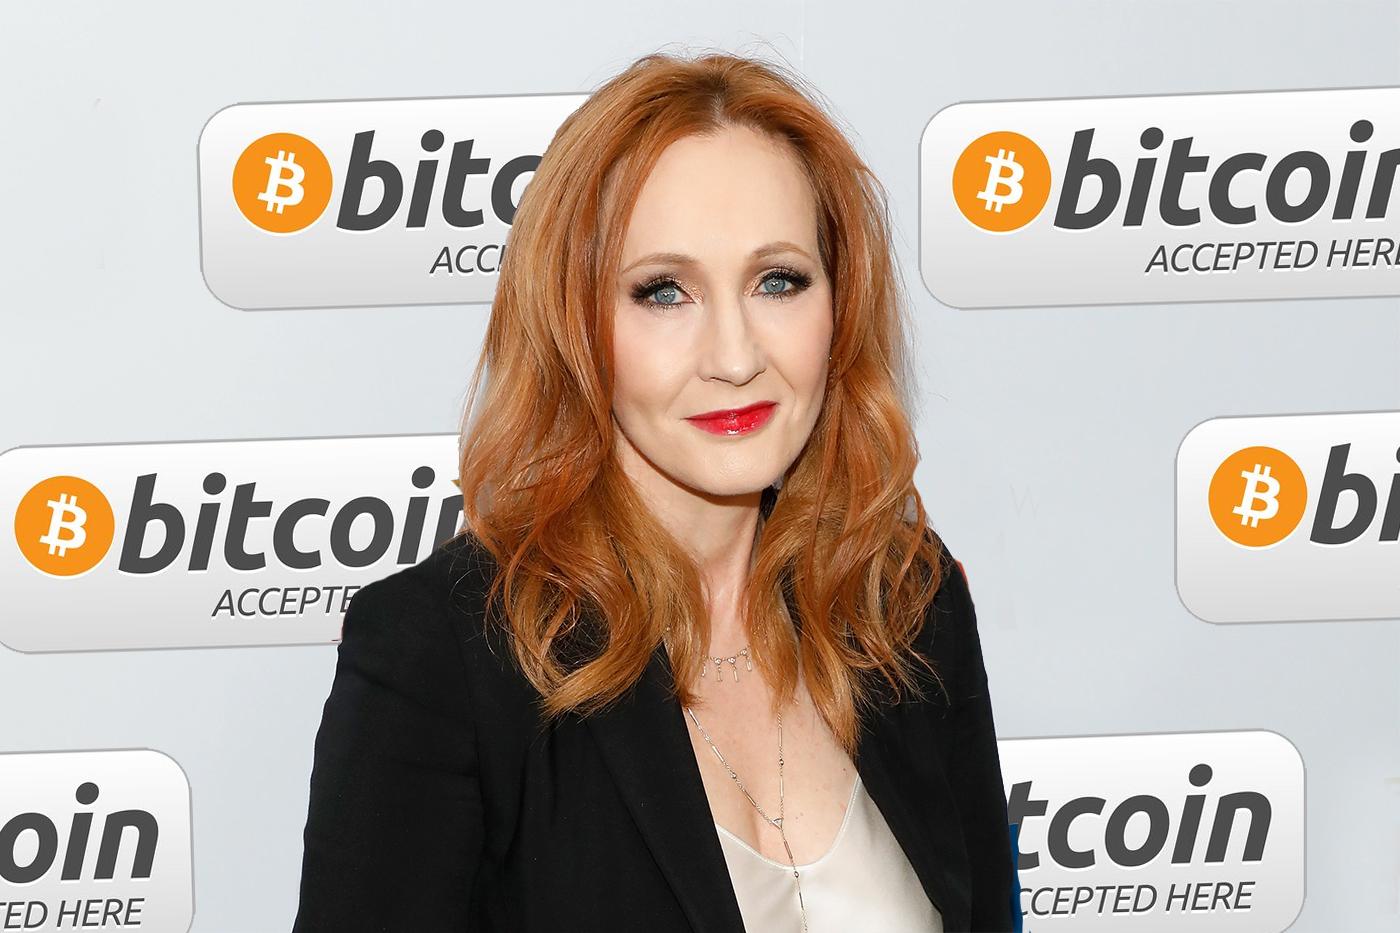 Crypto Twitter Fails to Explain Bitcoin to Harry Potter Author, JK Rowling